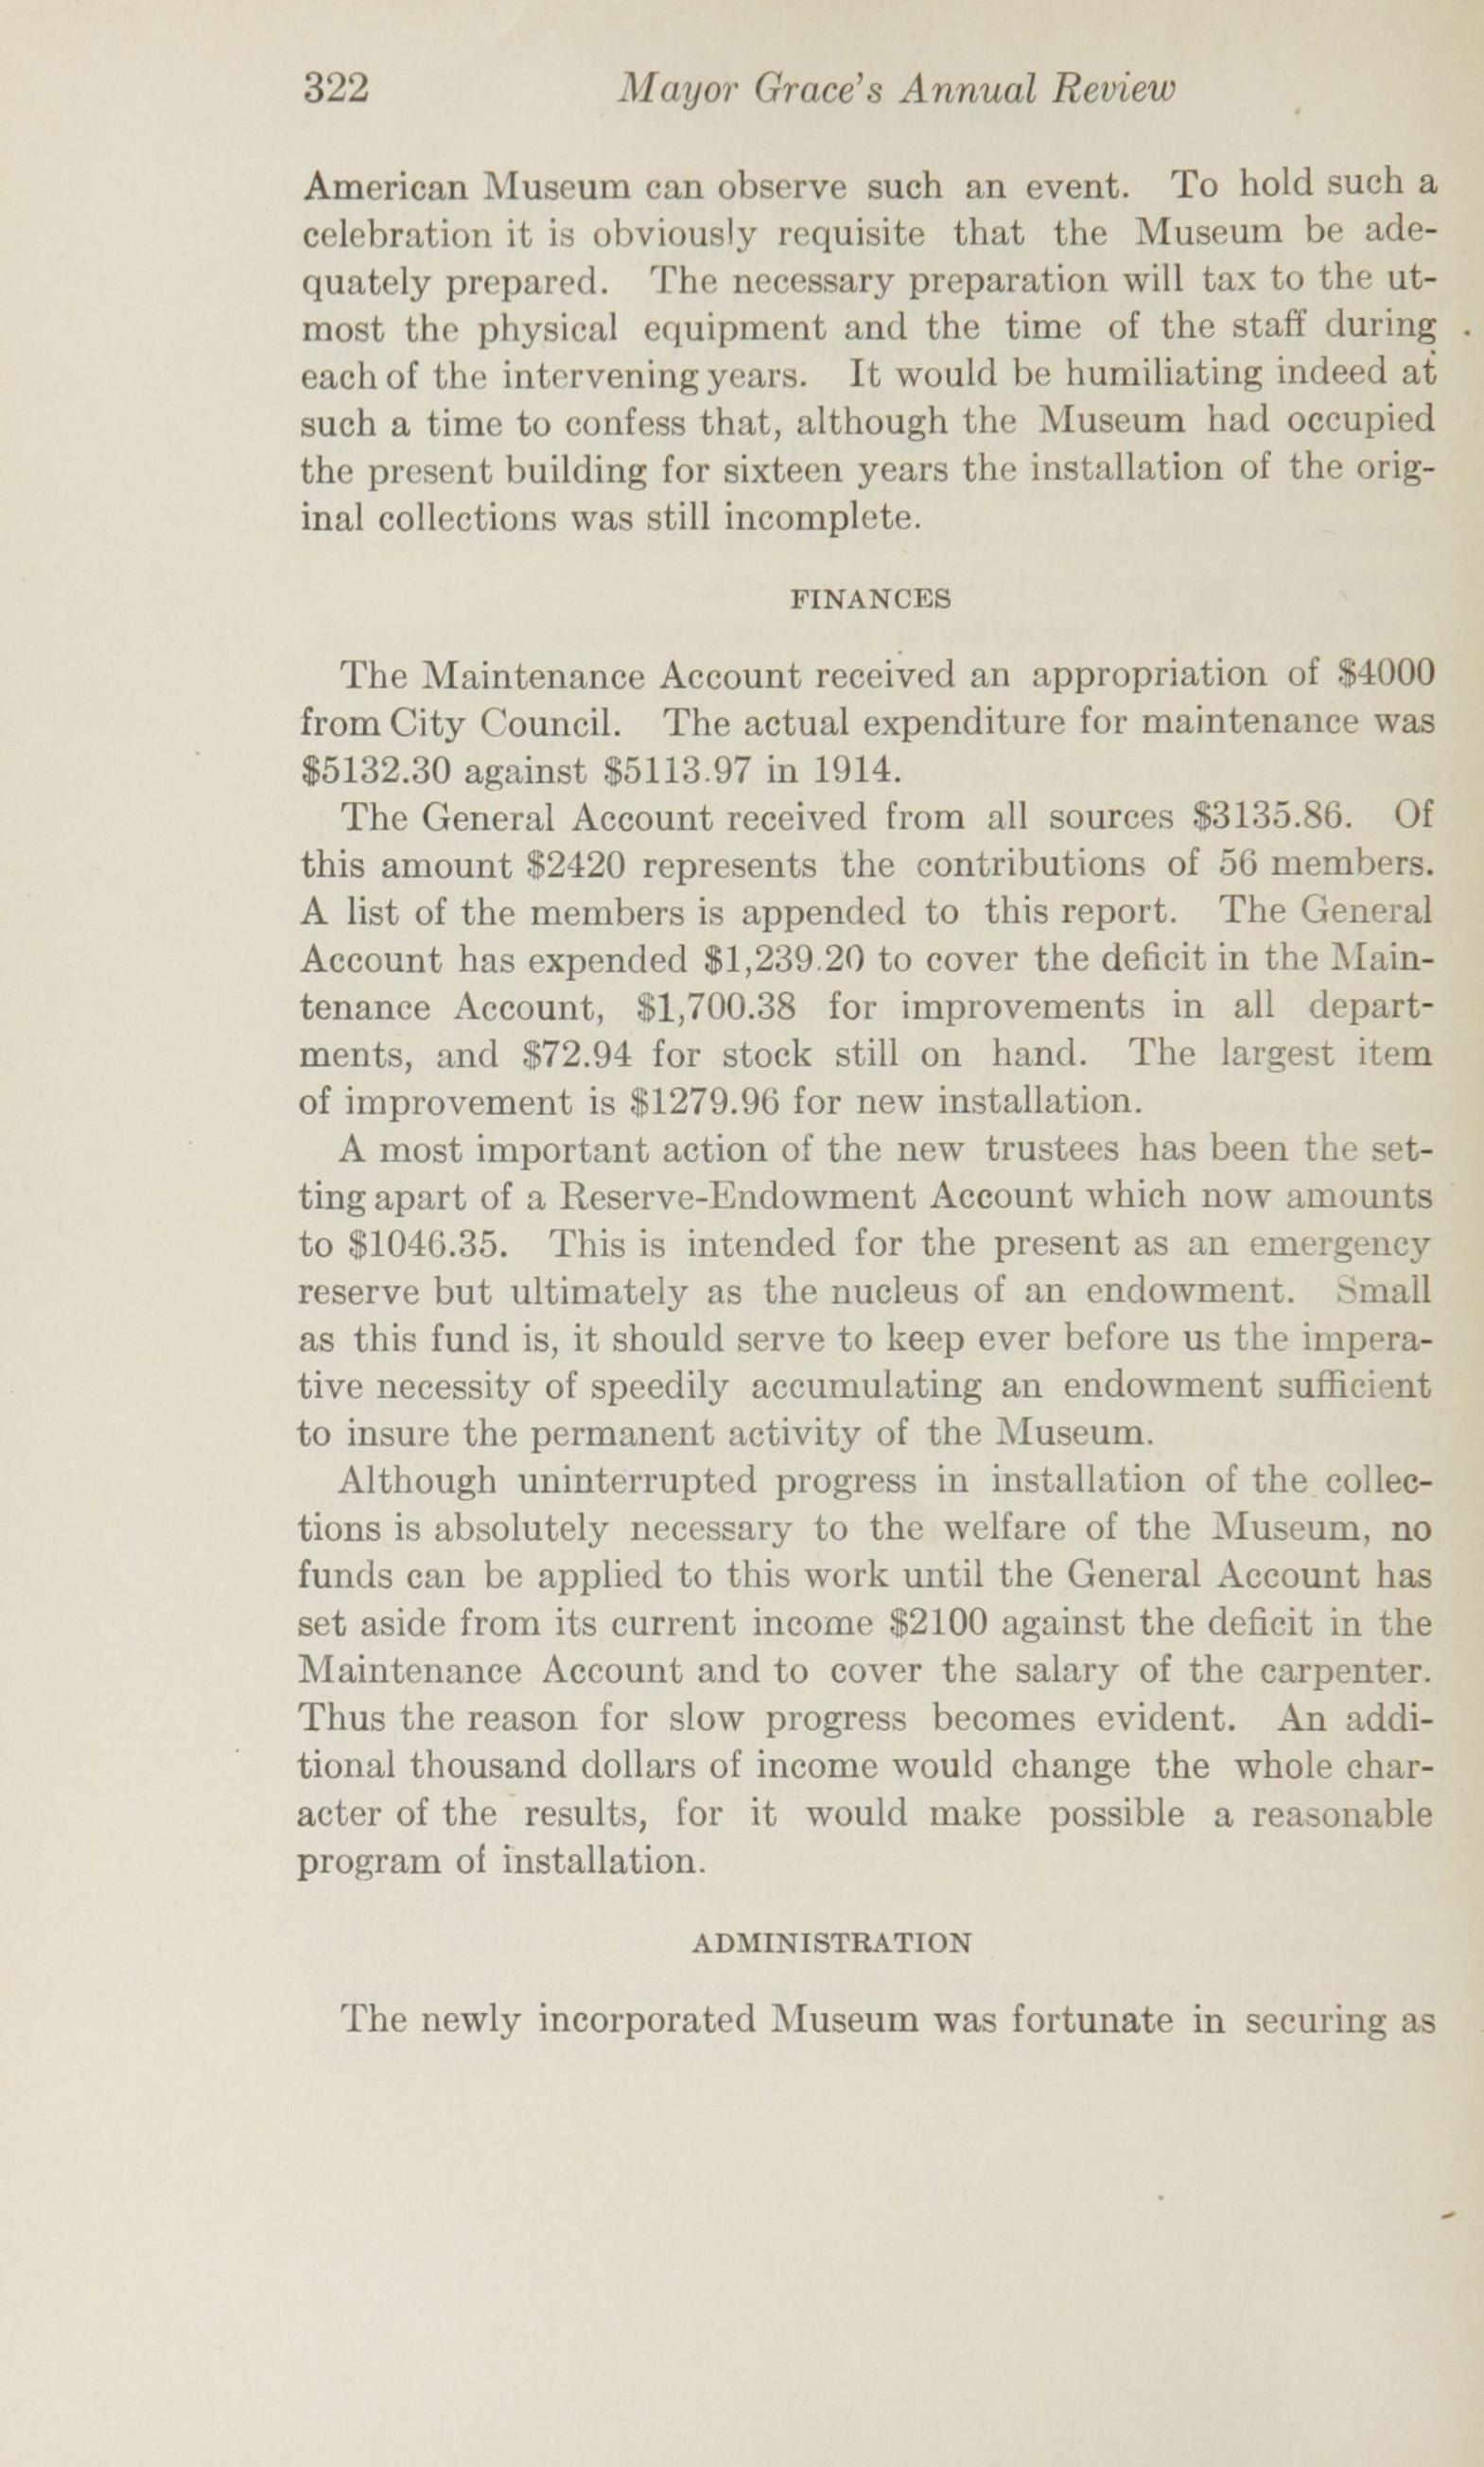 Charleston Yearbook, 1915, page 322